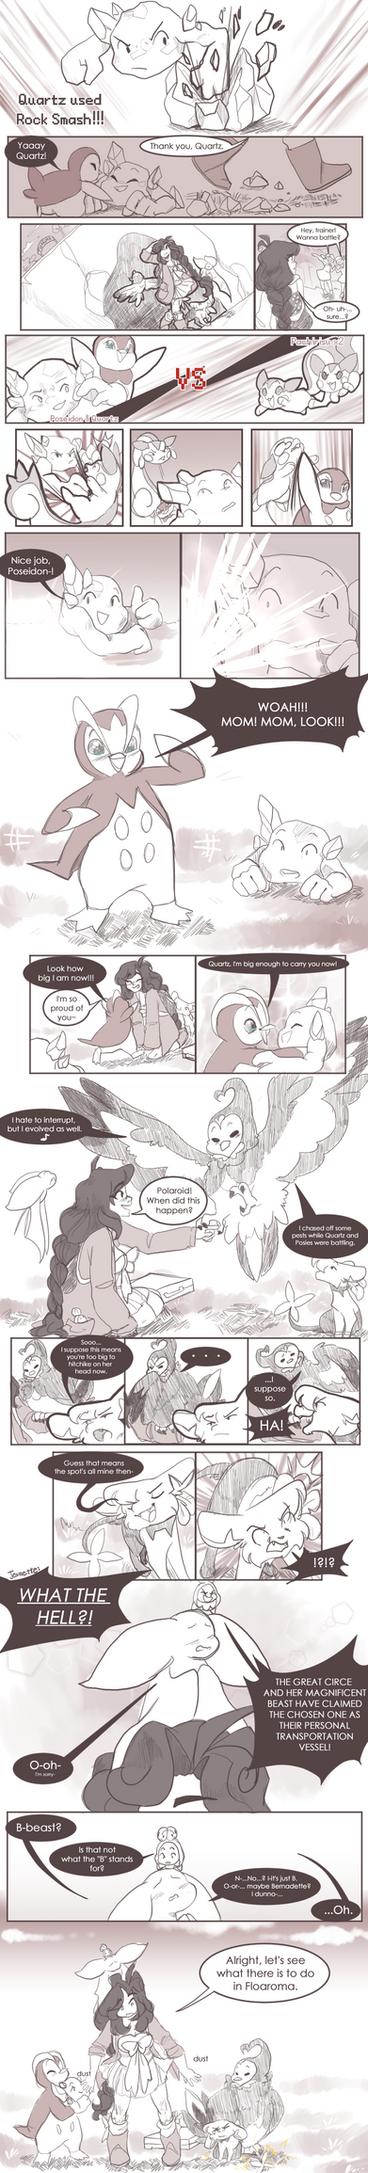 Lissylocke page 11 by Skitea